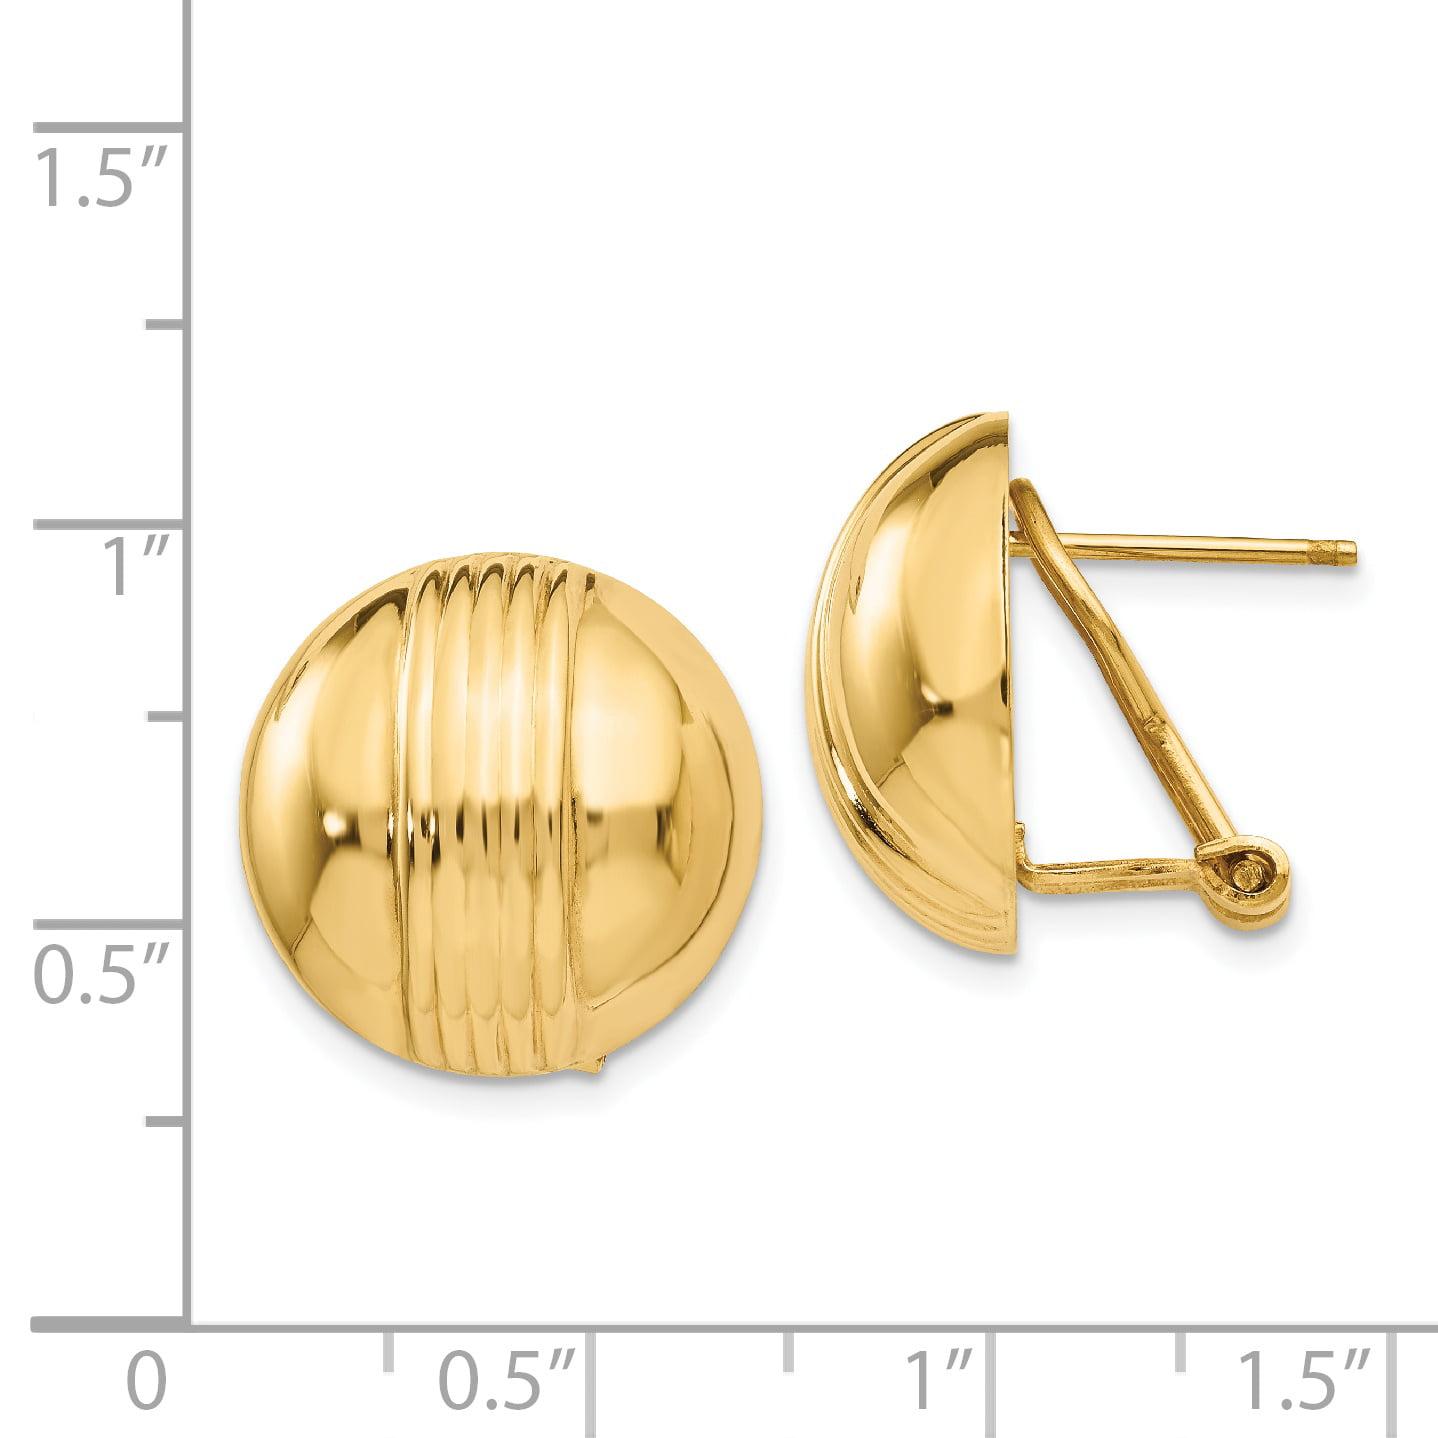 14K Yellow Gold Omega Post Earrings - image 1 of 2